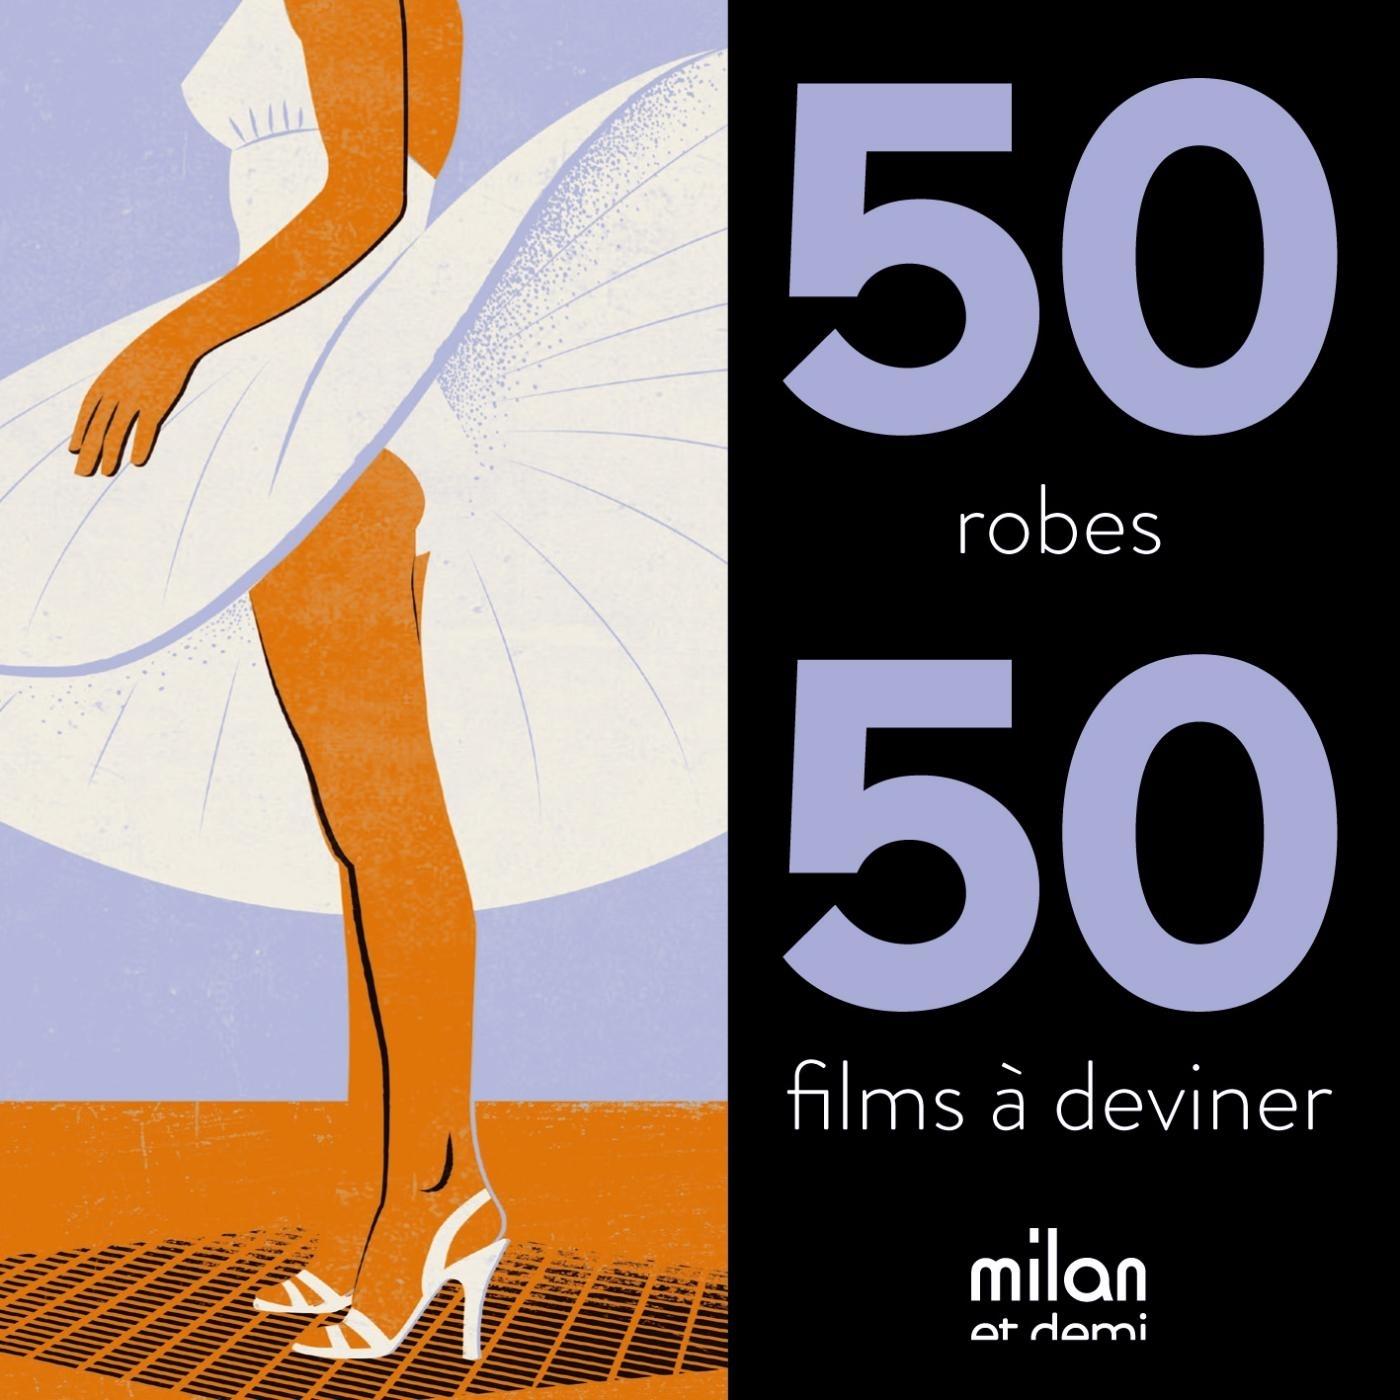 50 ROBES, 50 FILMS